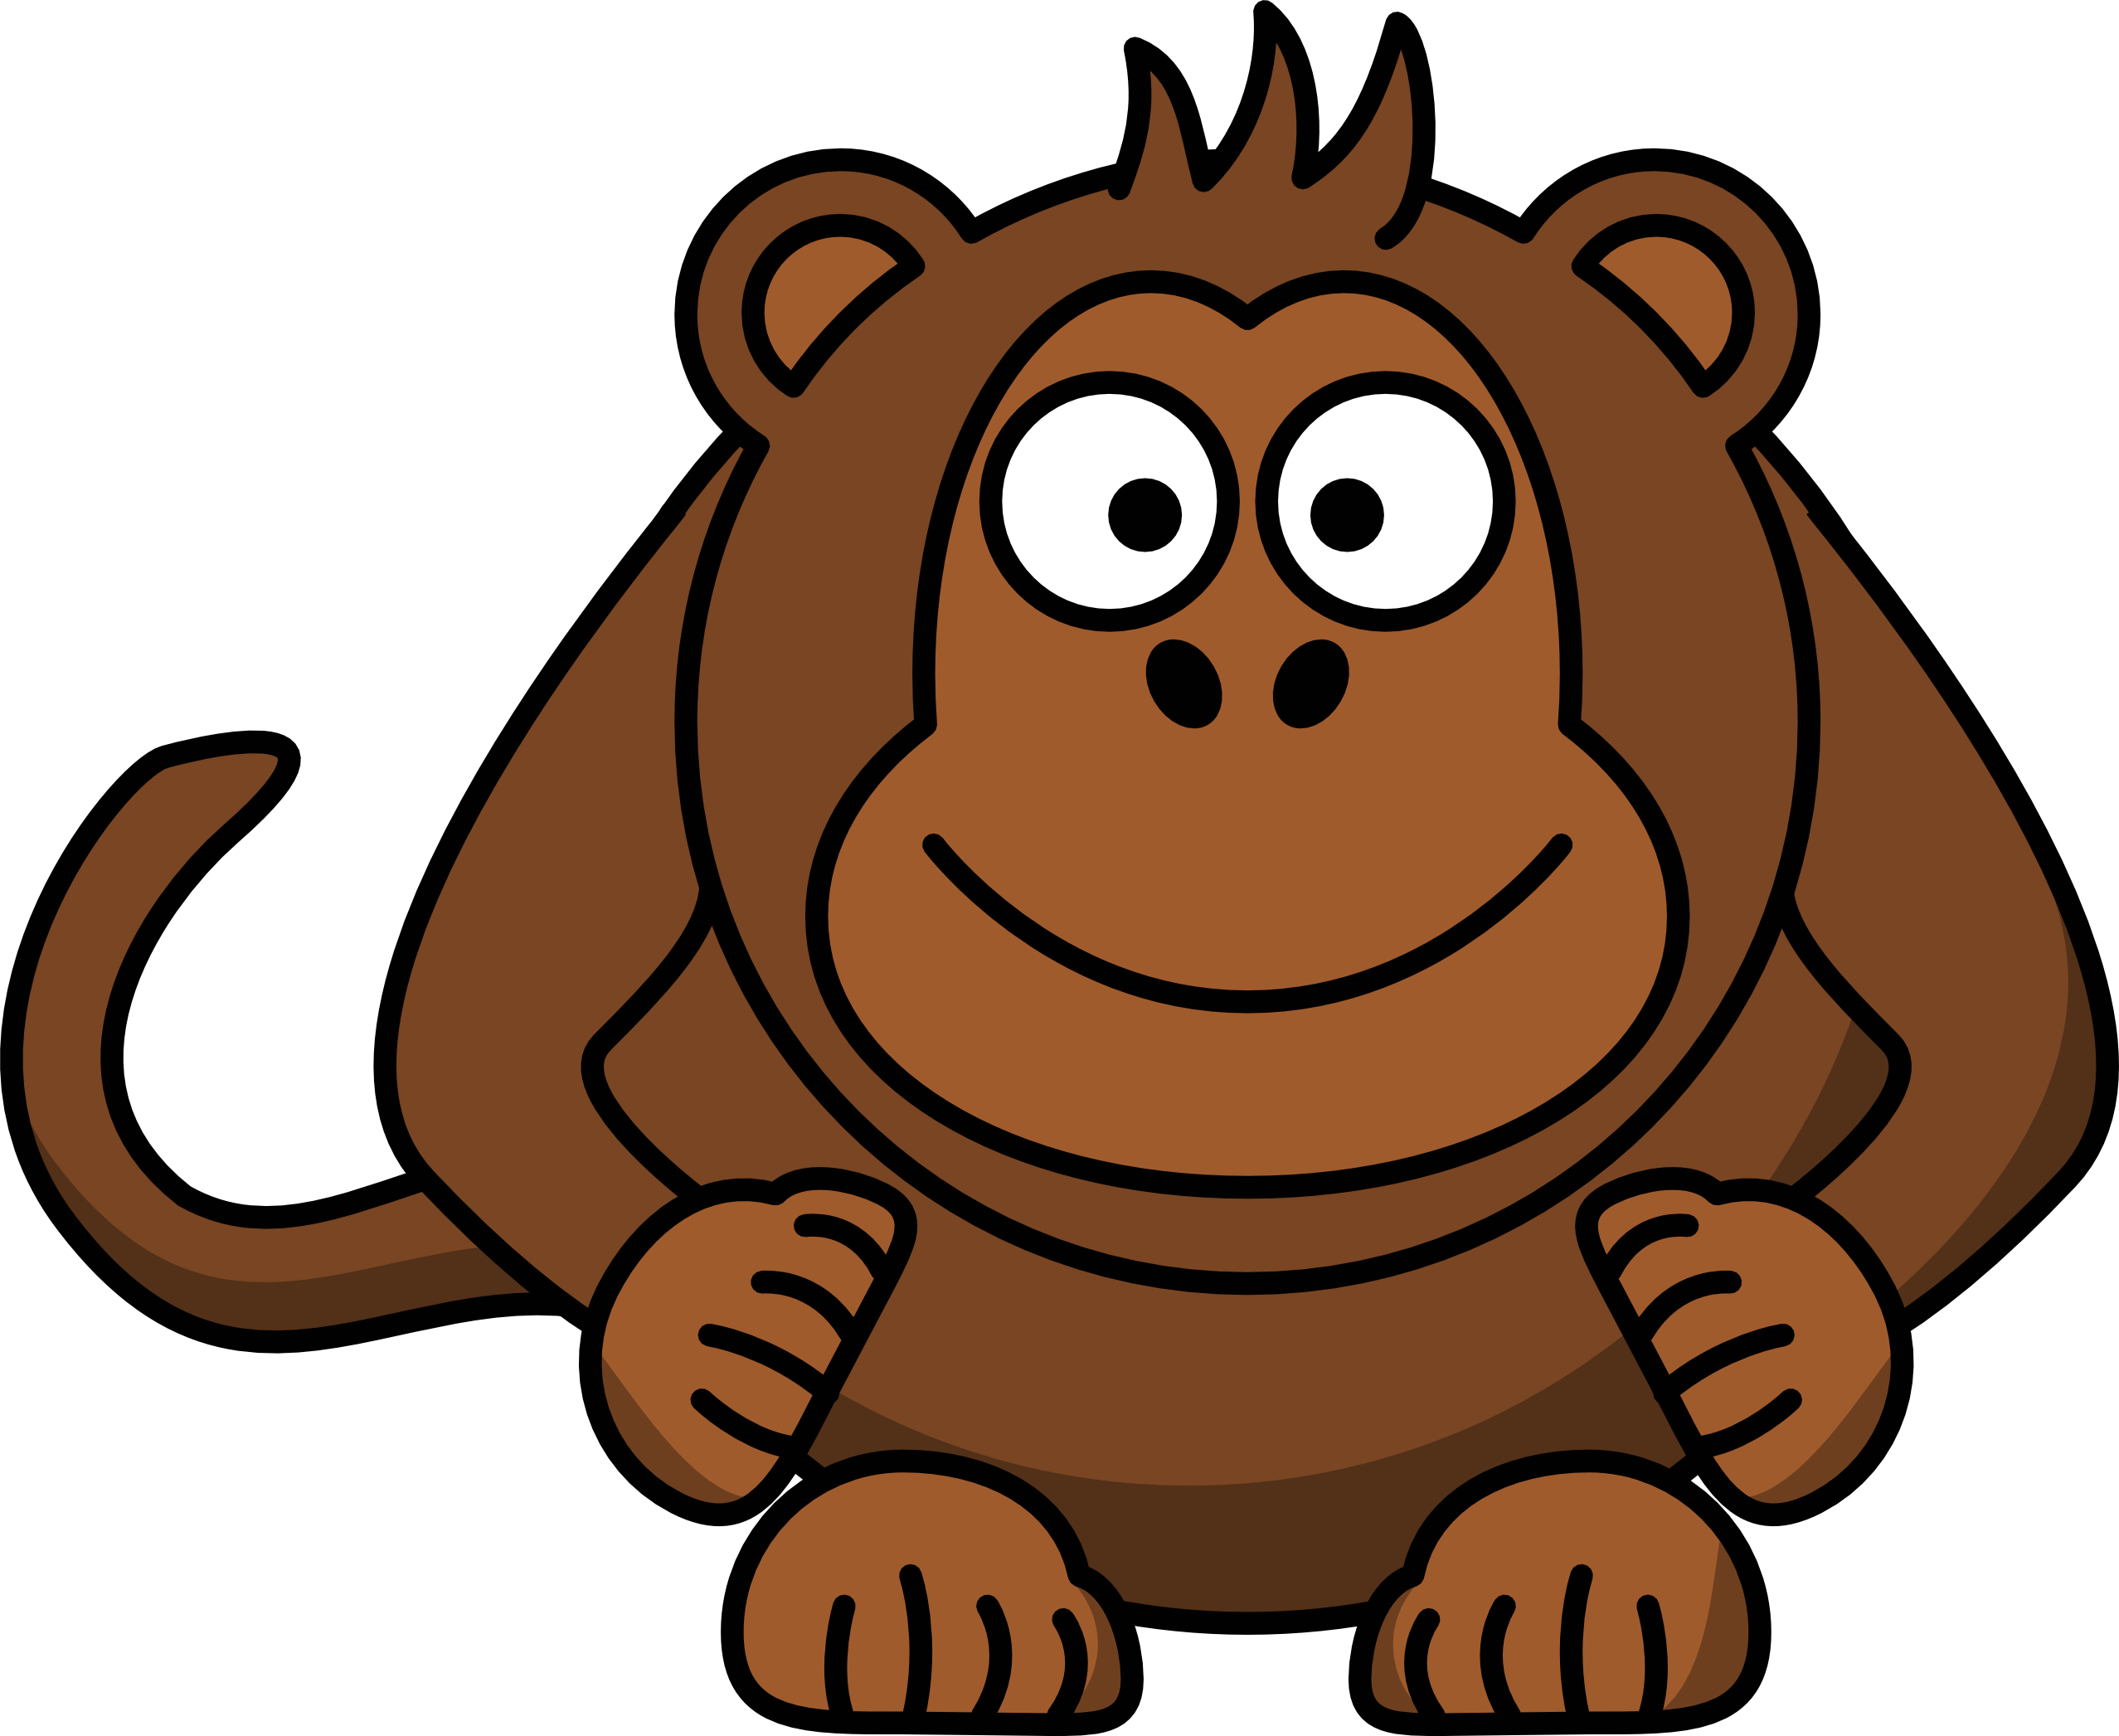 Clipart pencil monkey. Cartoon drawing at getdrawings